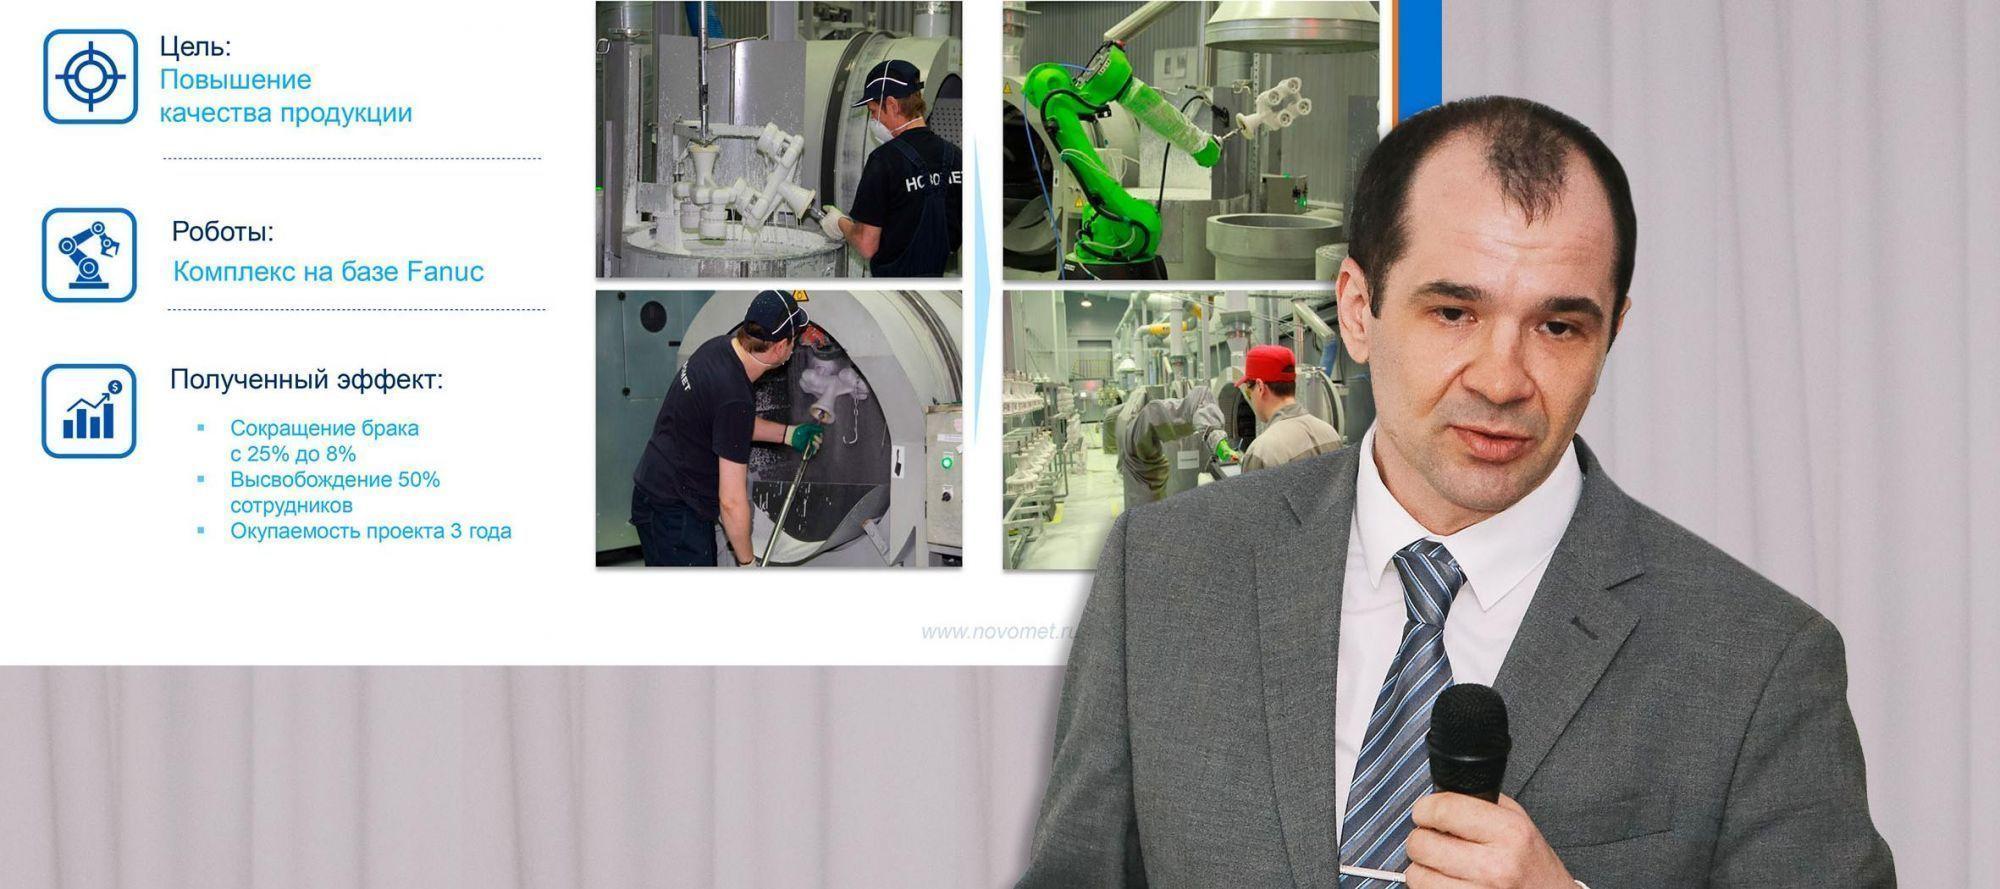 Цифровизация и роботизация производственного процесса: Новомет представил на форуме новую концепцию.